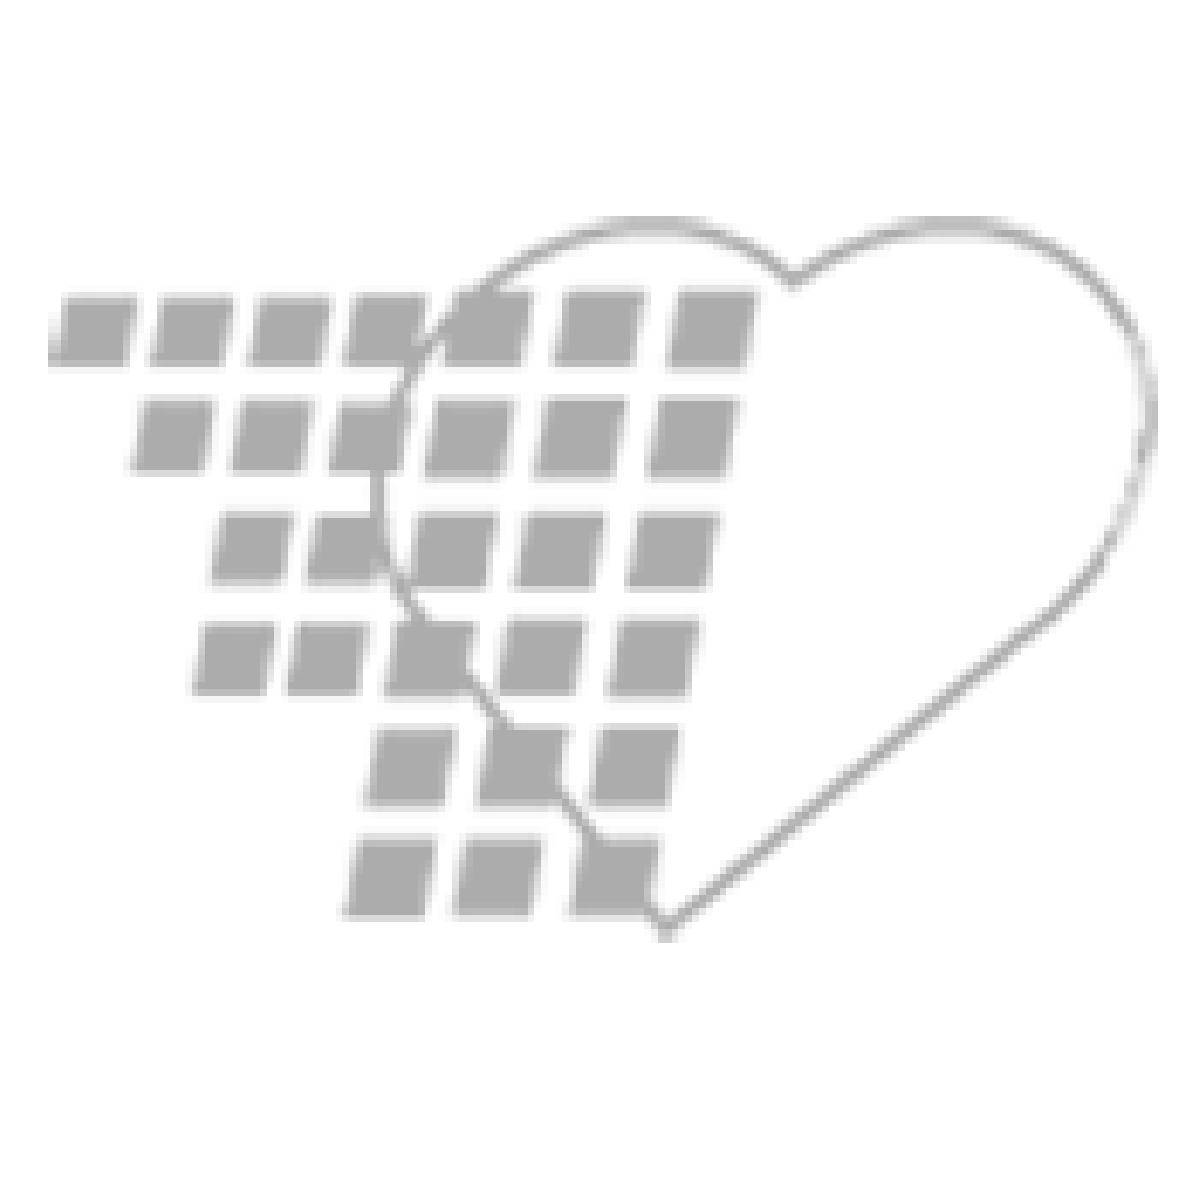 "06-82-3015[P Magellan™ 3 mL Syringe with Hypodermic Safety Needle - 21 G x 1"""